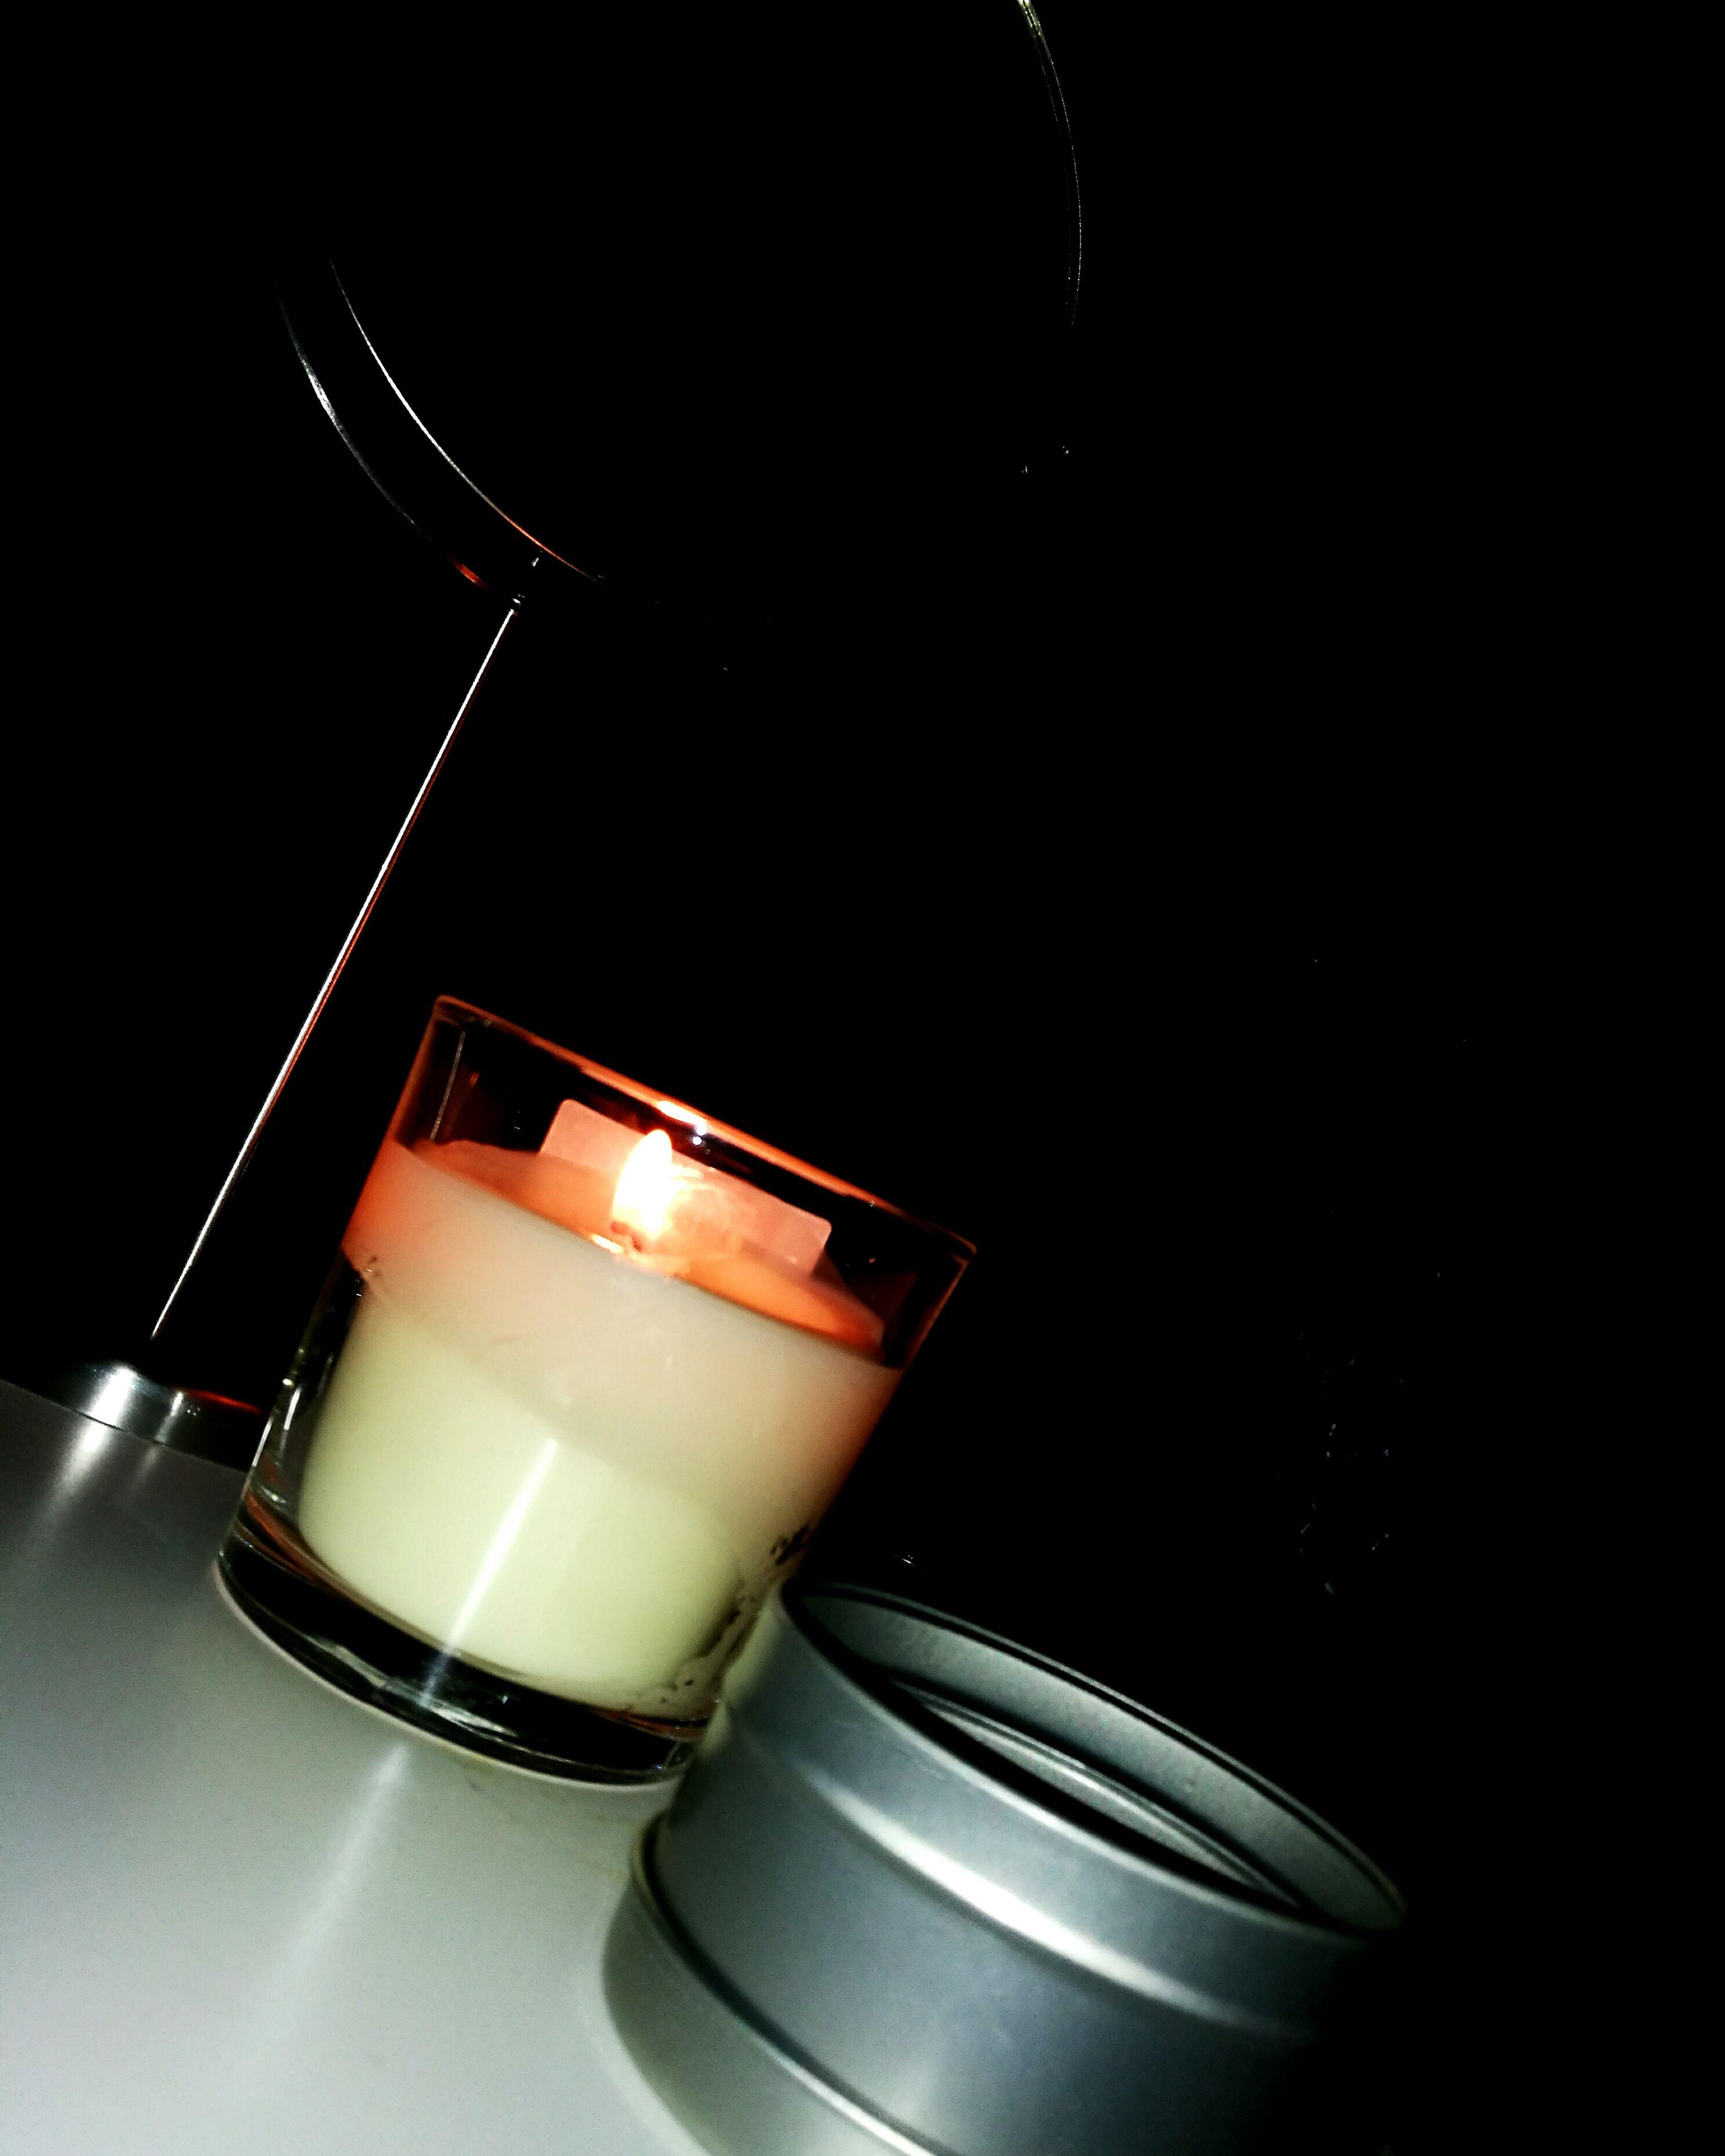 black background, no people, studio shot, burning, close-up, drink, illuminated, heat - temperature, indoors, tea light